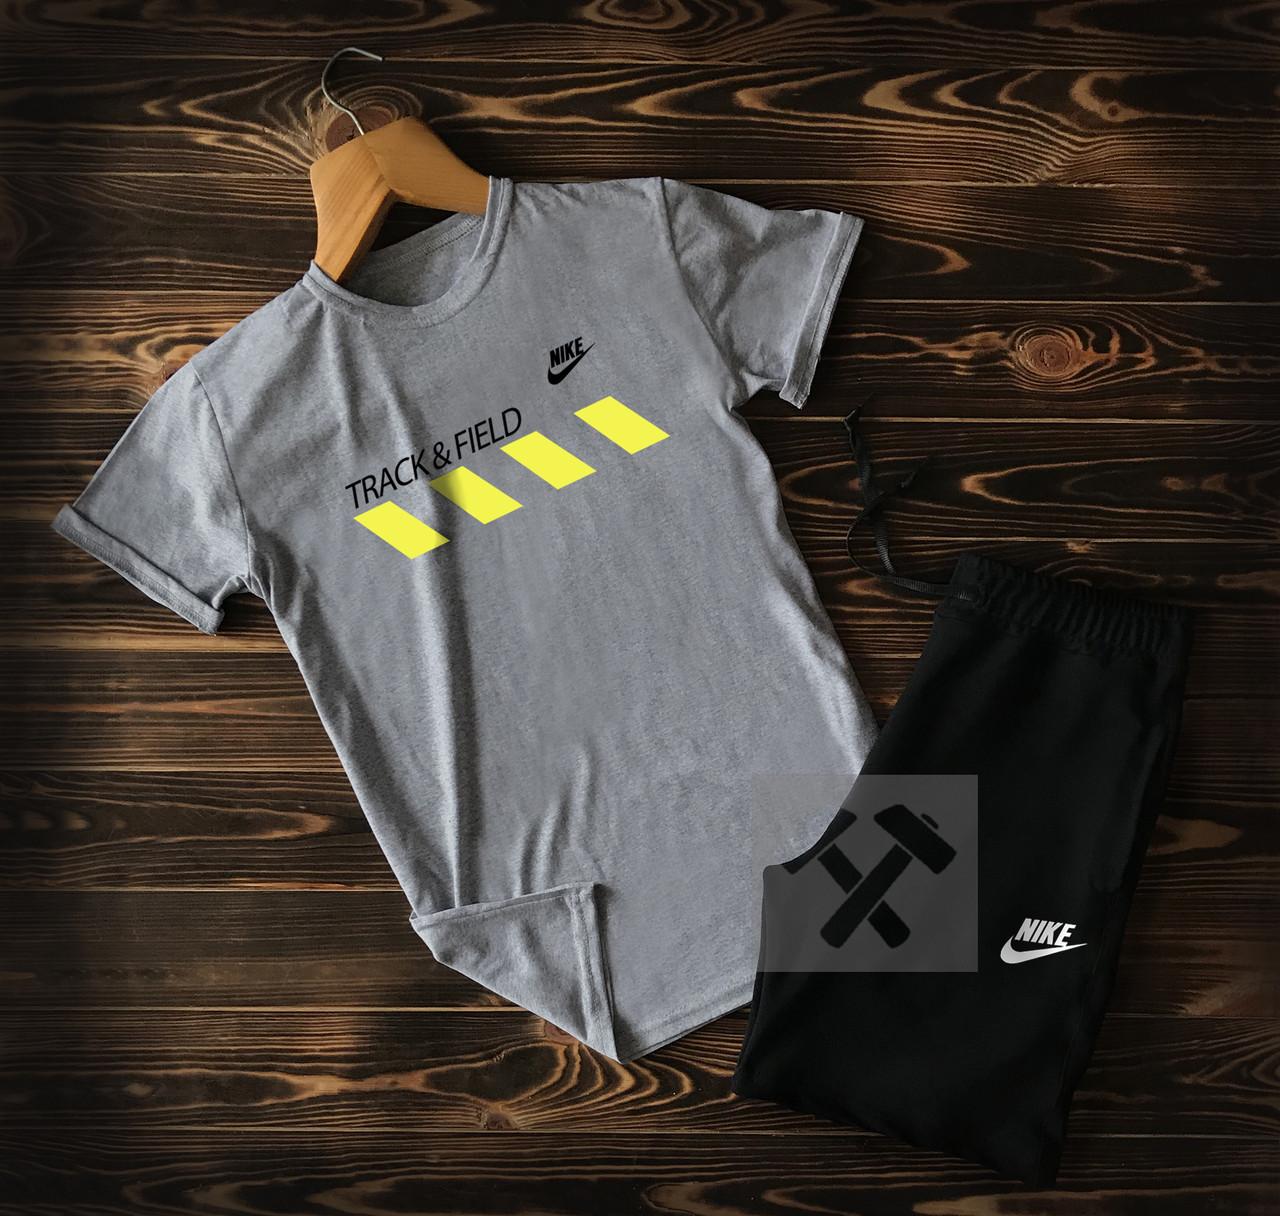 0ac94225 Летний мужской спортивный костюм Nike Track Field черно-серого цвета -  Интернет магазин обуви «